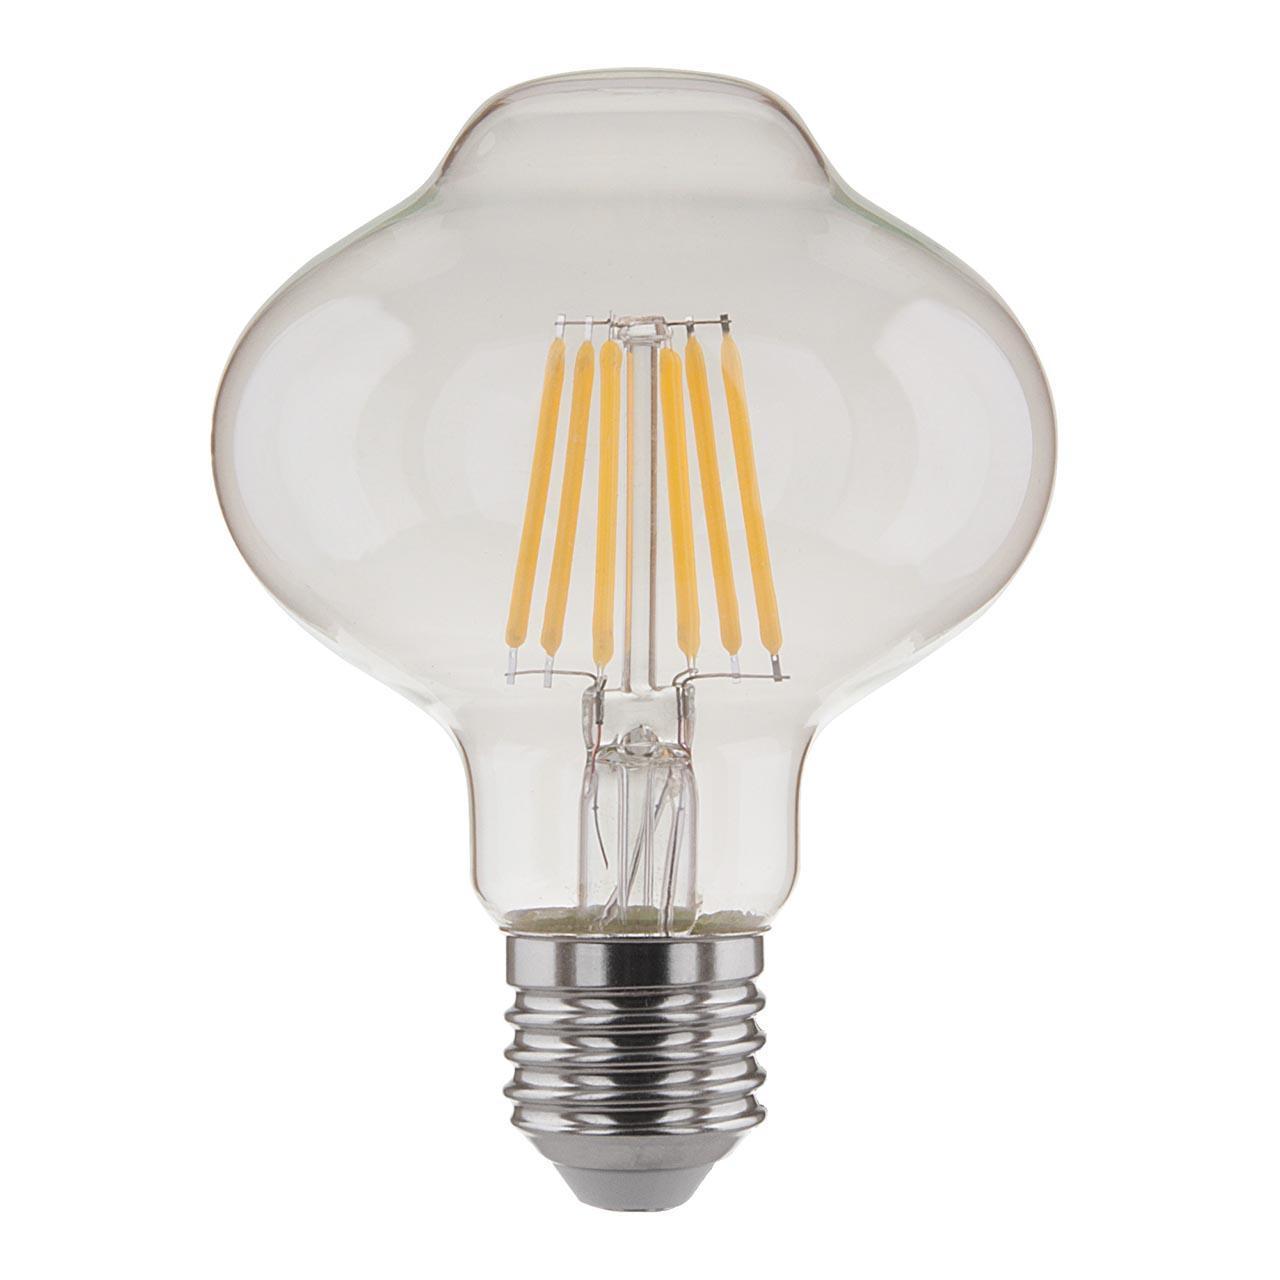 elektrostandard лампа светодиодная elektrostandard classic led d 10w 4200k e27 4690389085543 Лампа светодиодная филаментная E27 10W 4200K прозрачная 4690389125218